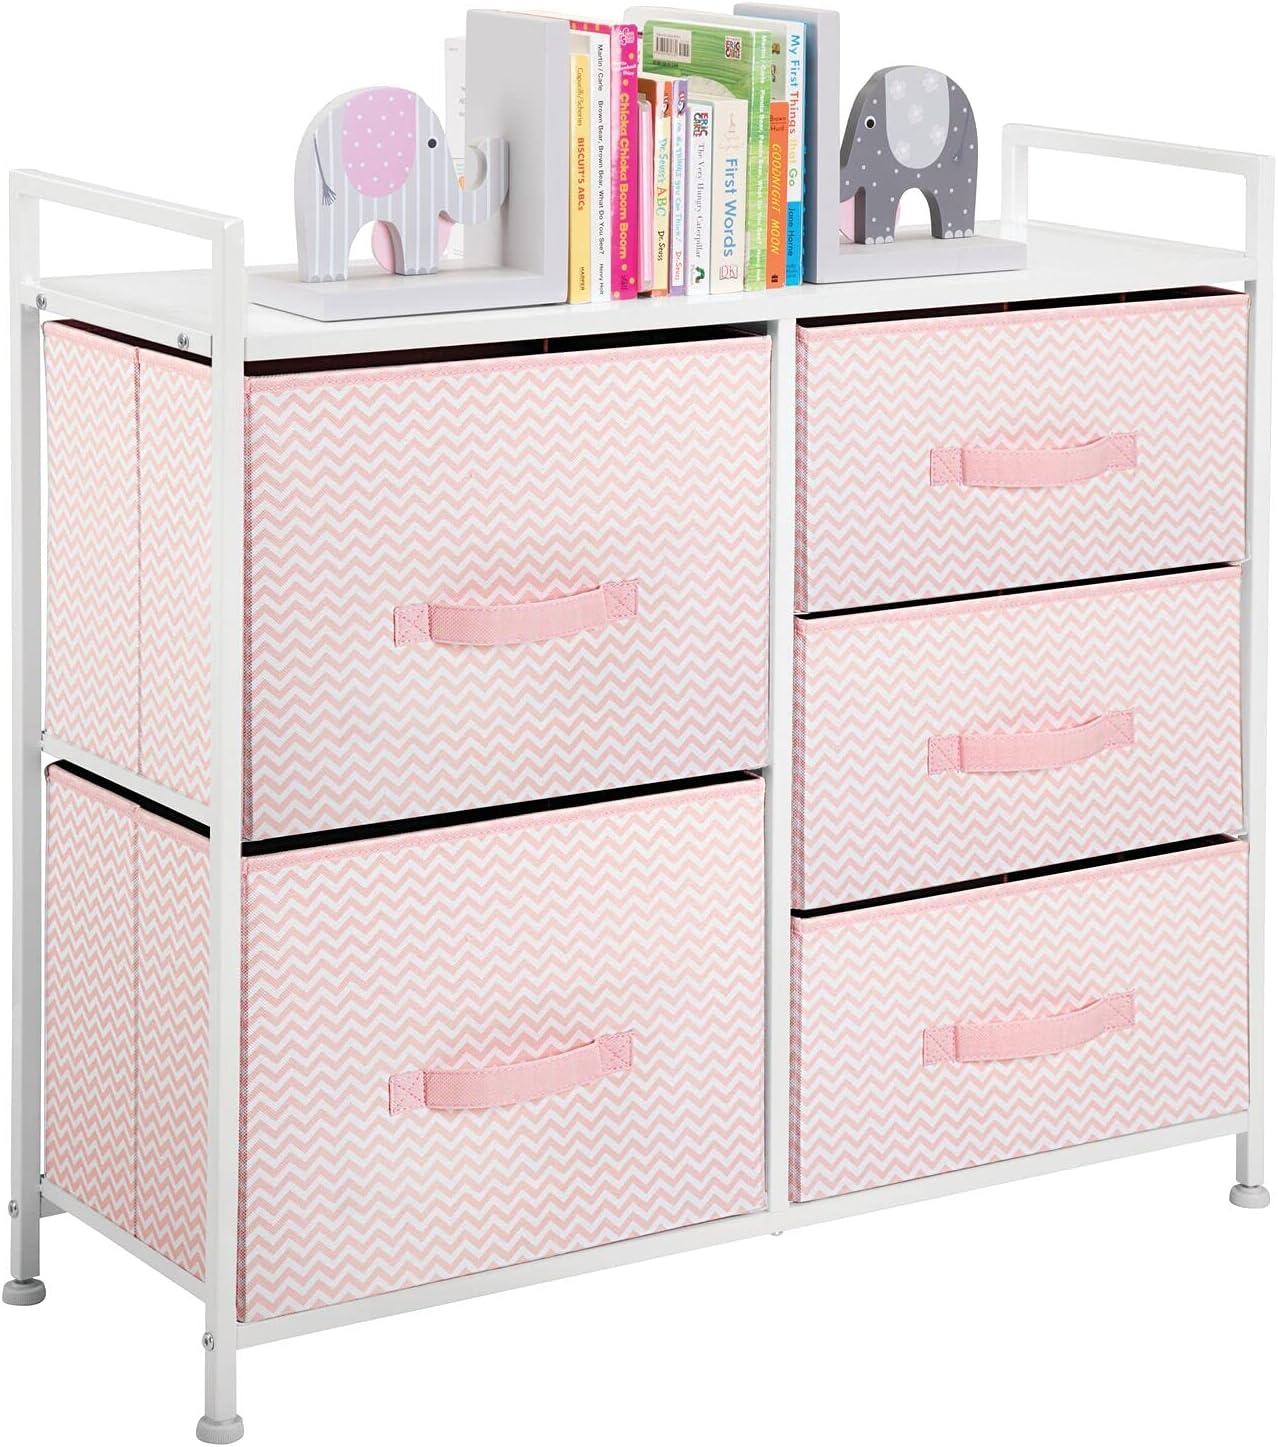 mDesign Max 74% OFF Storage Dresser Excellence Furniture Unit Standing - Organize Large